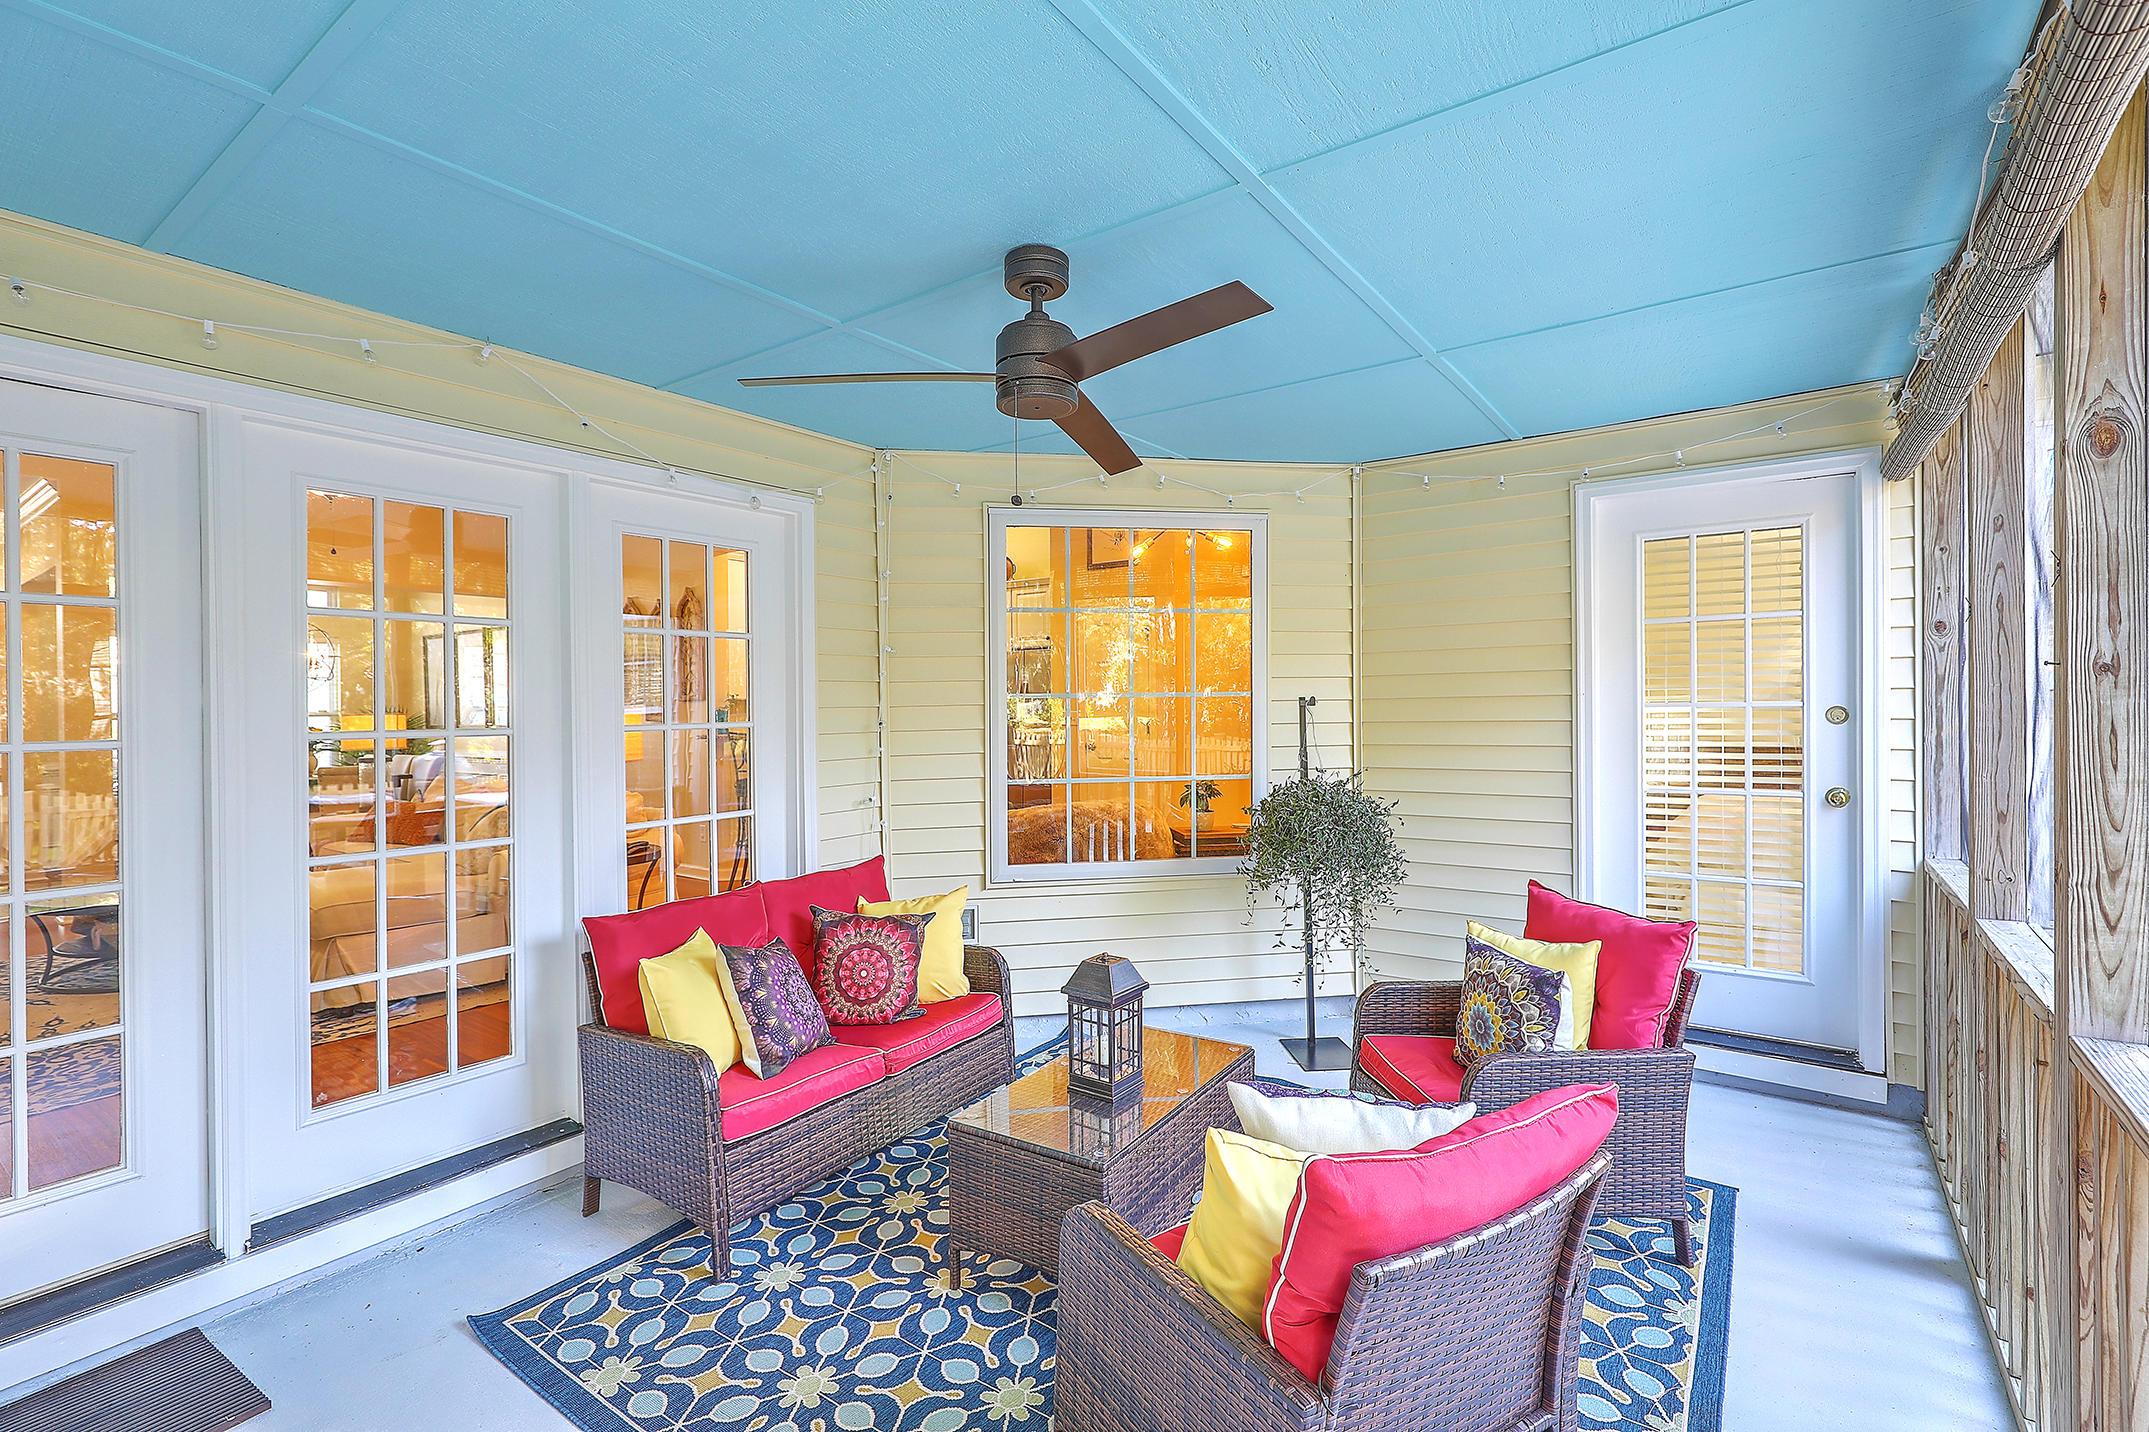 Dunes West Homes For Sale - 1471 Cypress Pointe, Mount Pleasant, SC - 16